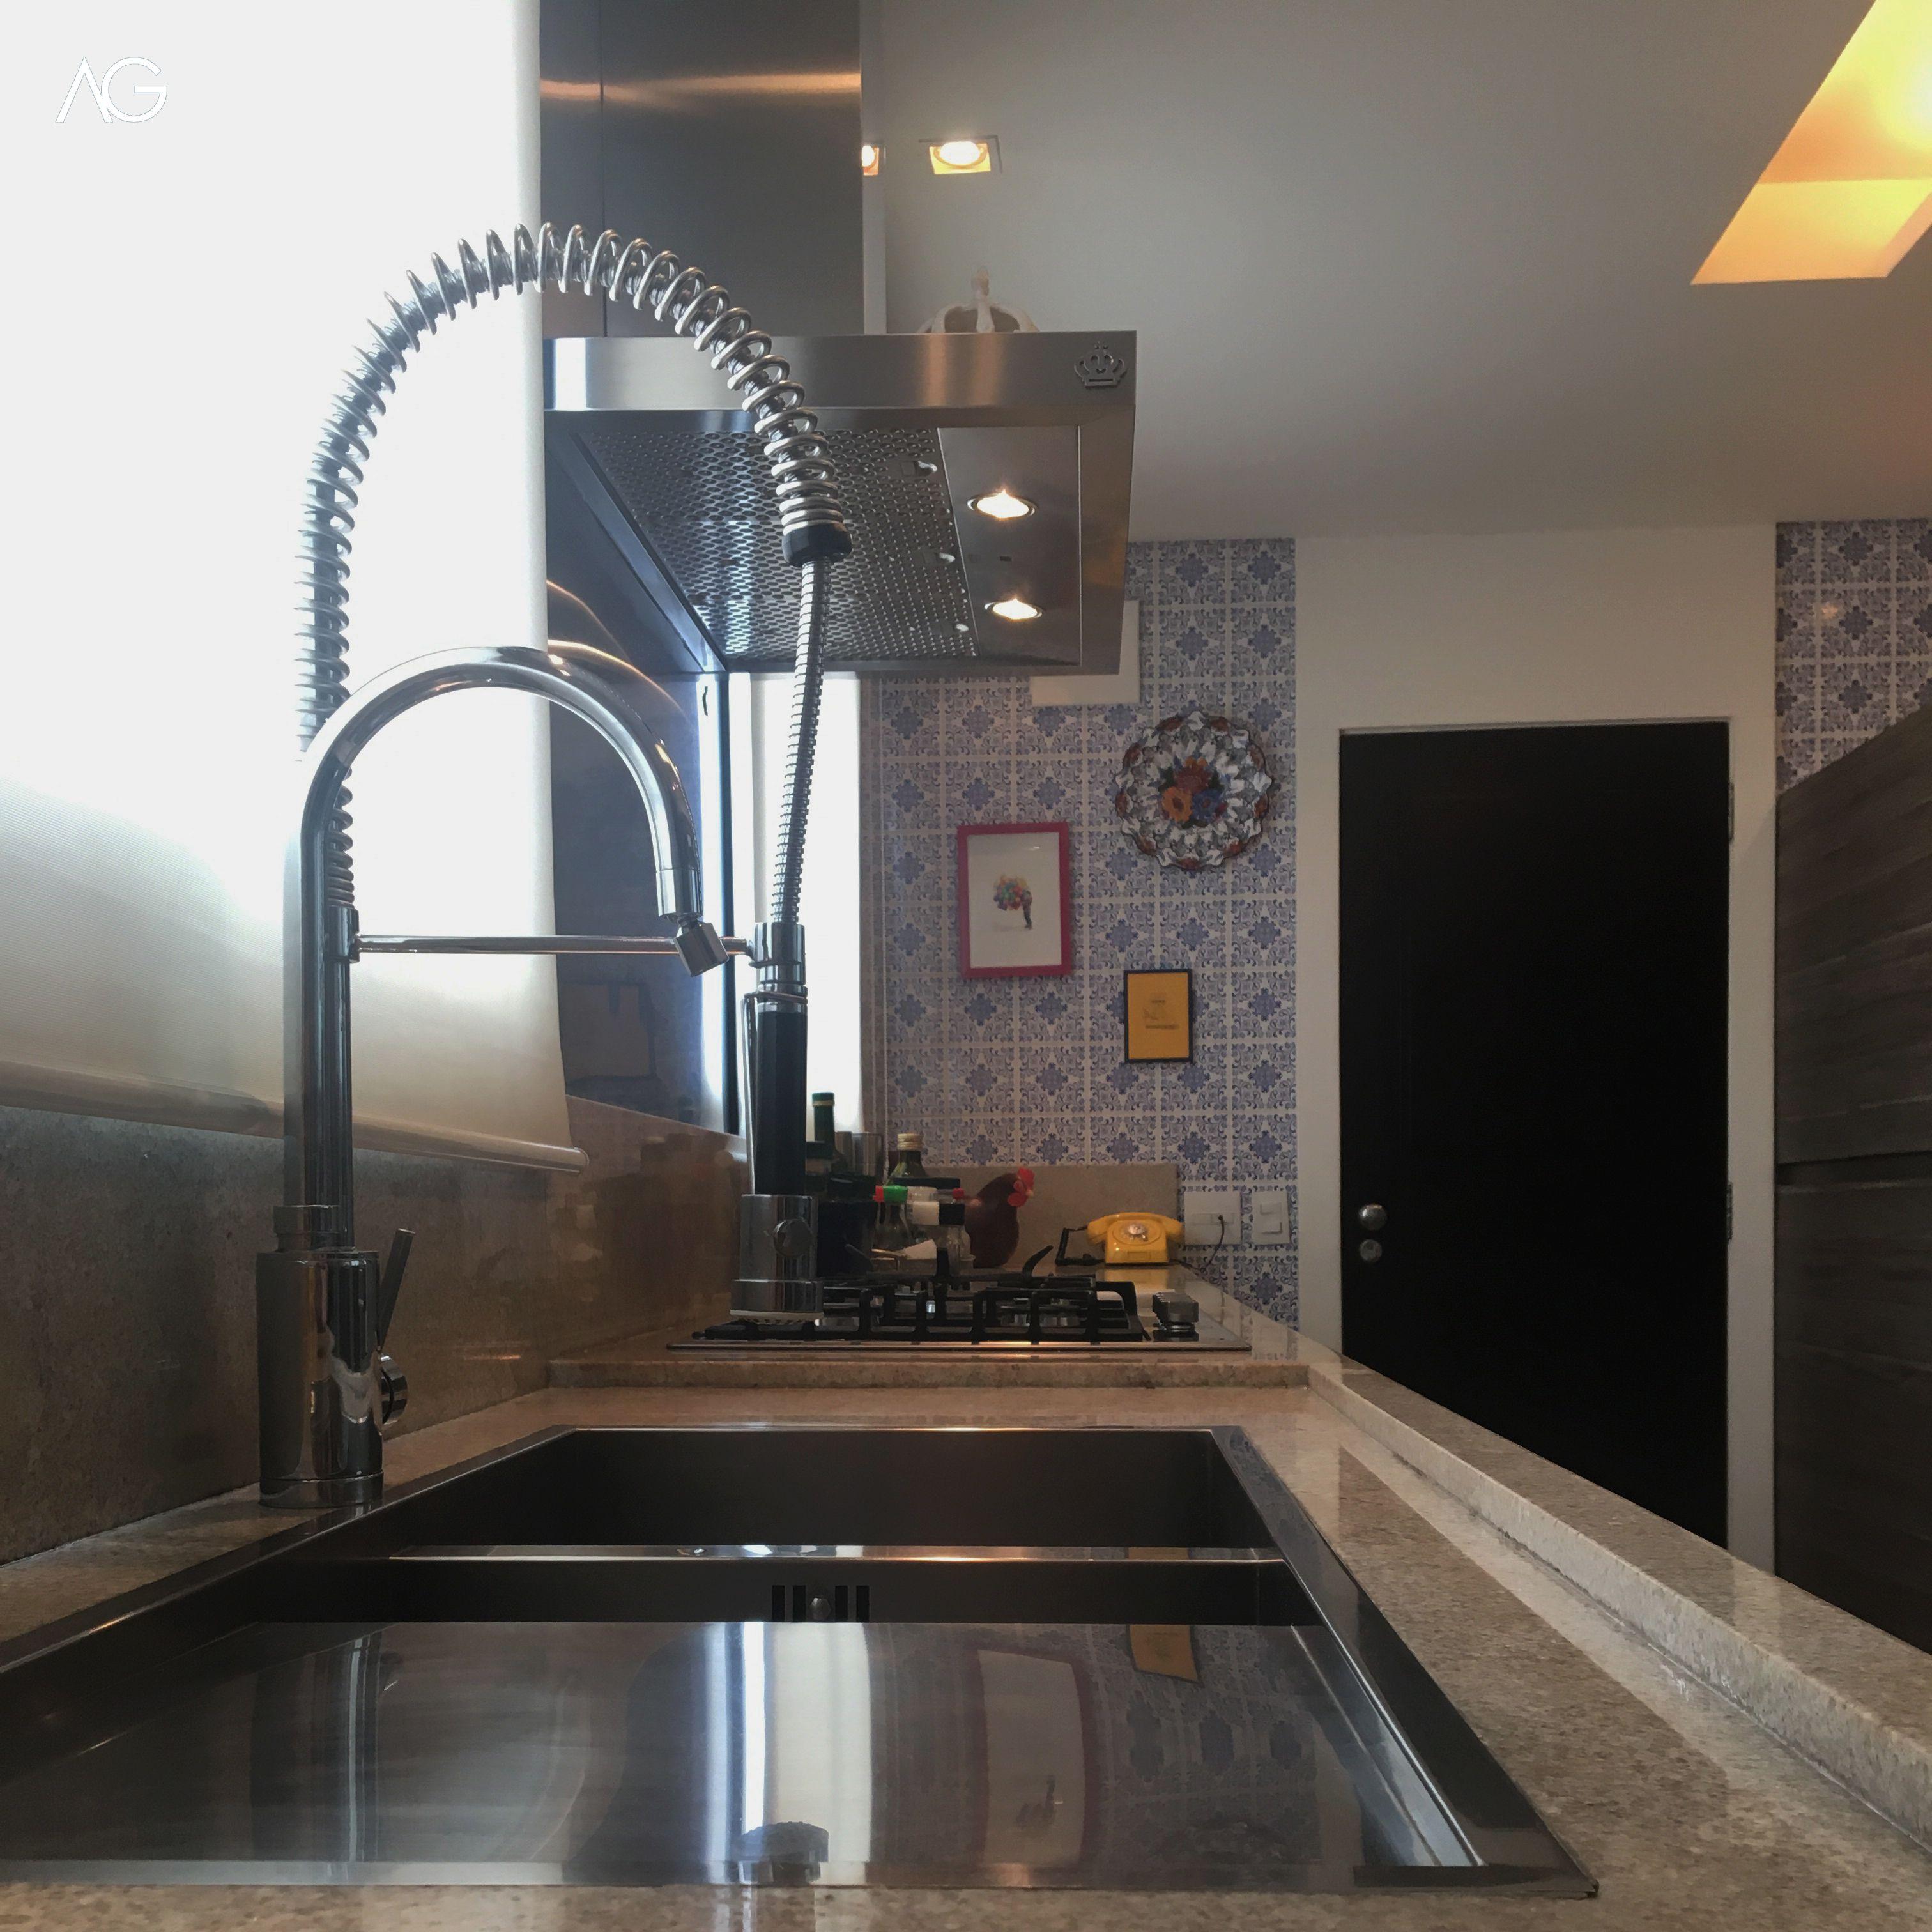 Cozinha Bancada Granito Branco Itaunas Cuba Embutida Torneira